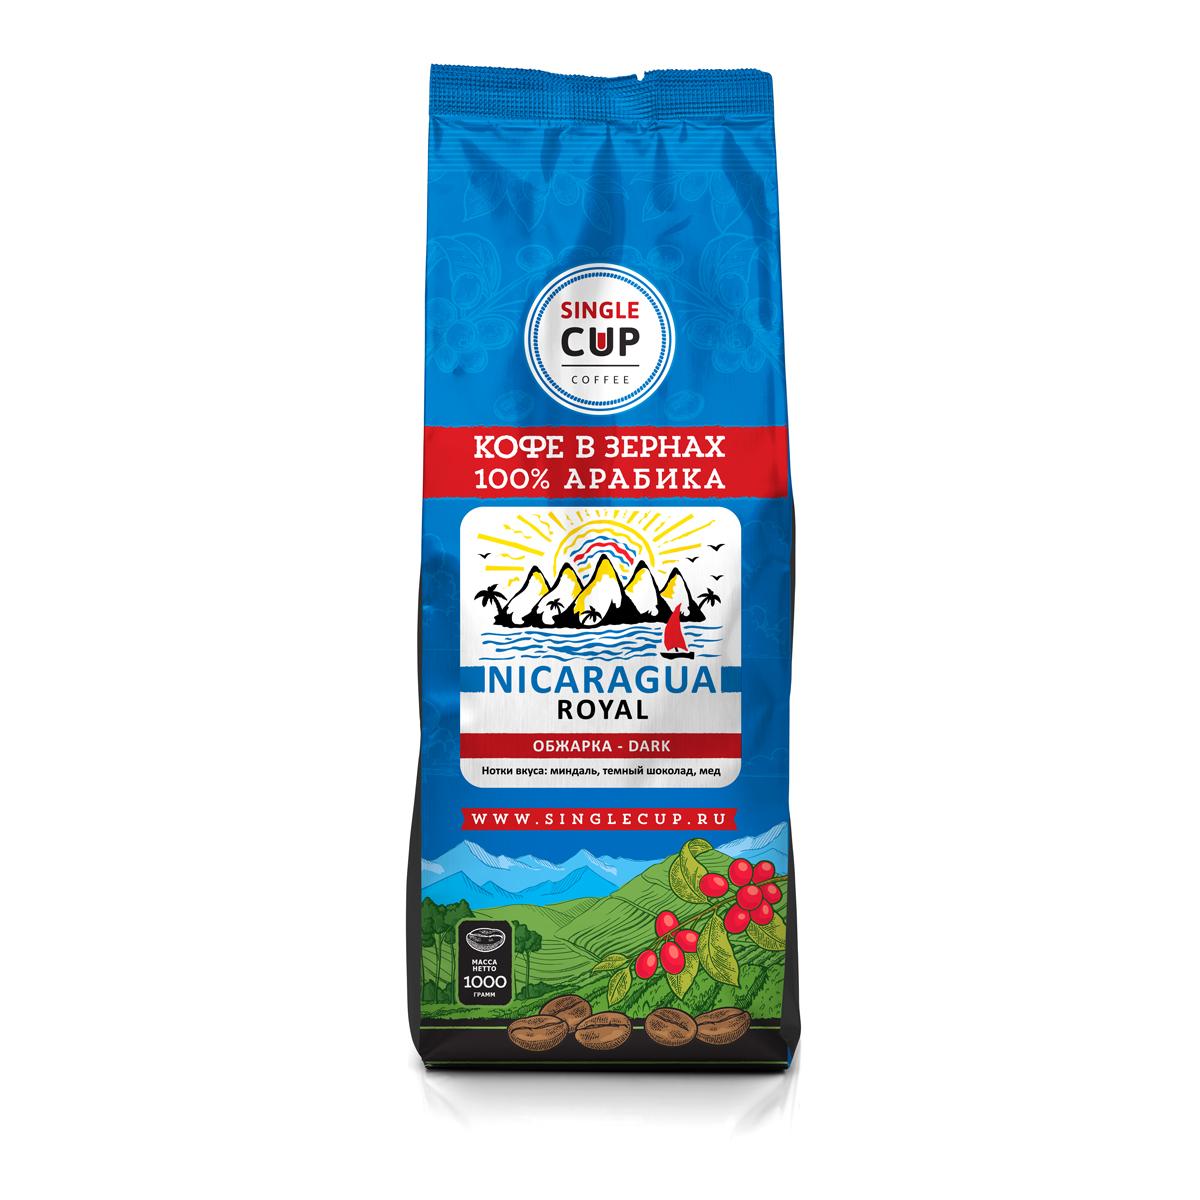 Кофе в зернах Single Cup Coffee Nicaragua Royal, 1000 г